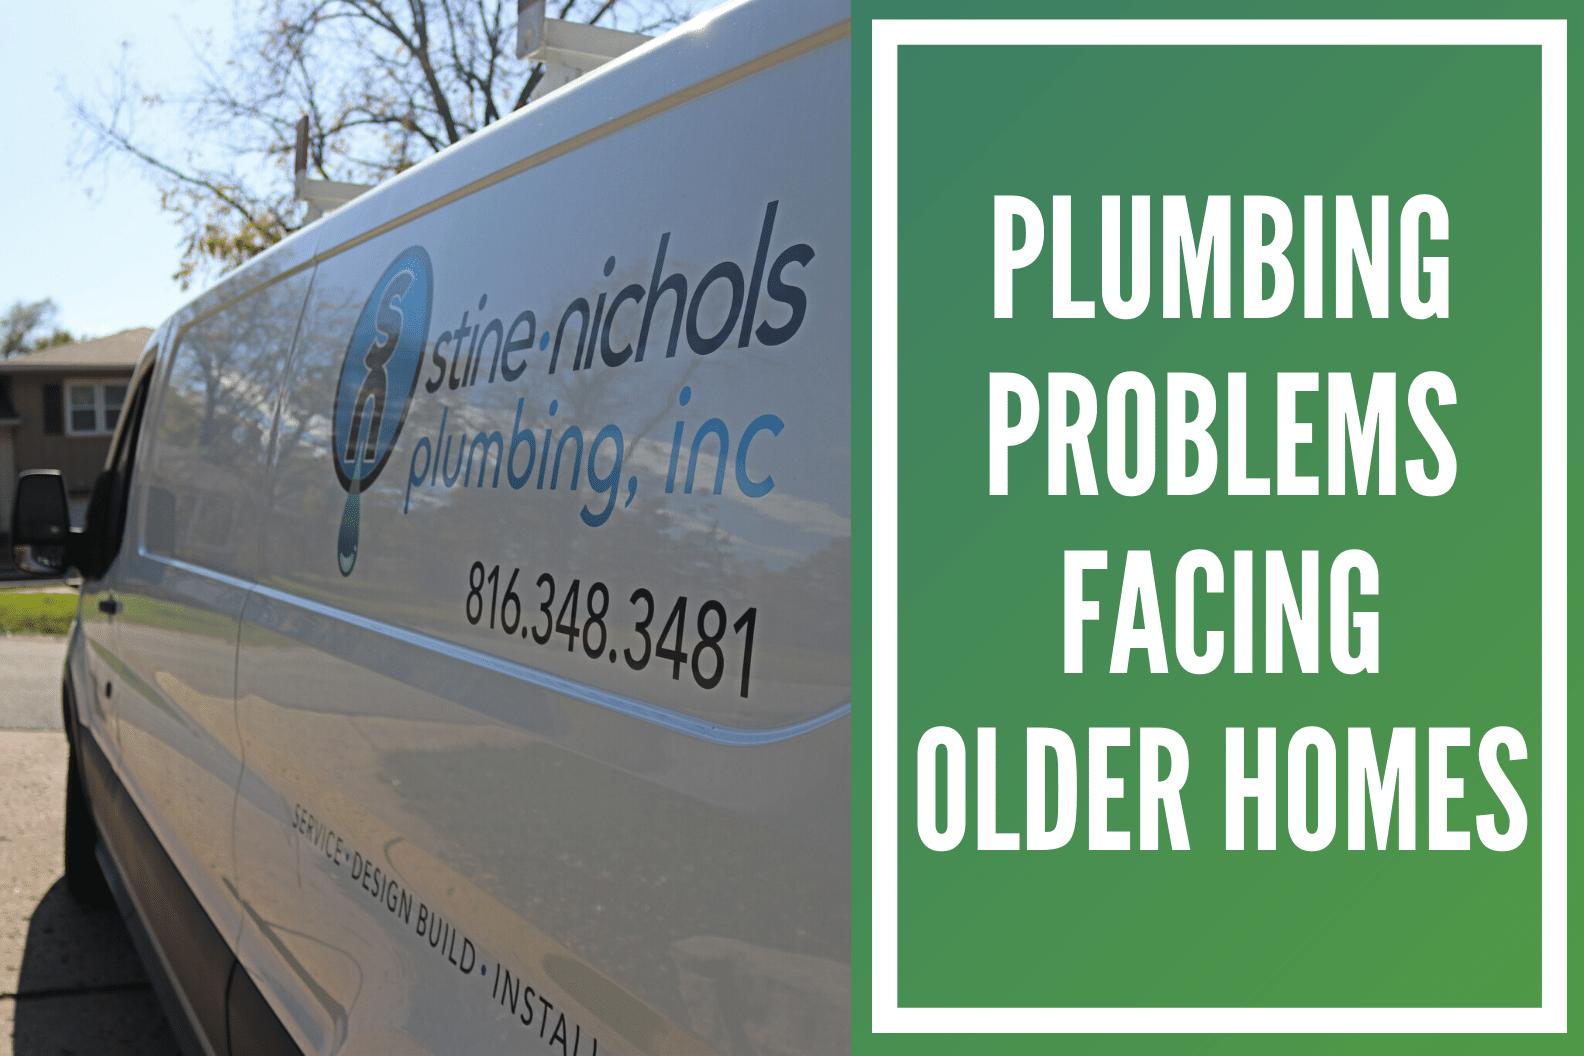 older homes plumbing problems blog thumbnail